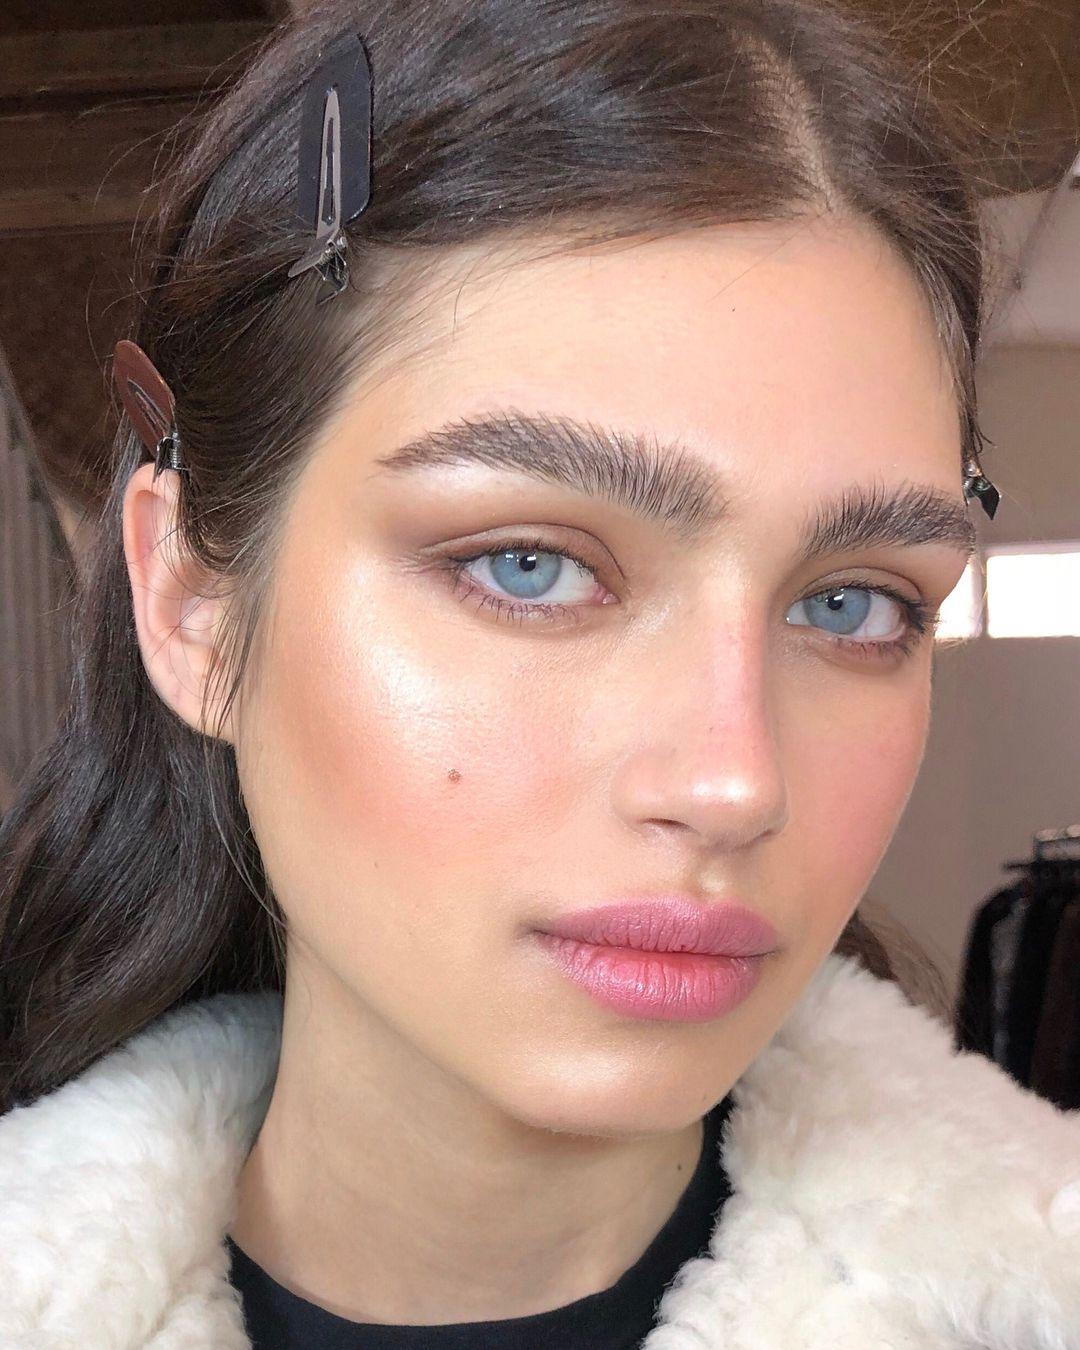 "Photo of Nikki_Makeup on Instagram: ""Bushy boy brows & luminous skin on this beautiful face @nastyazakharo  Using @iconic.london Pigment foundation stick & Prep Set Glow spray…"""